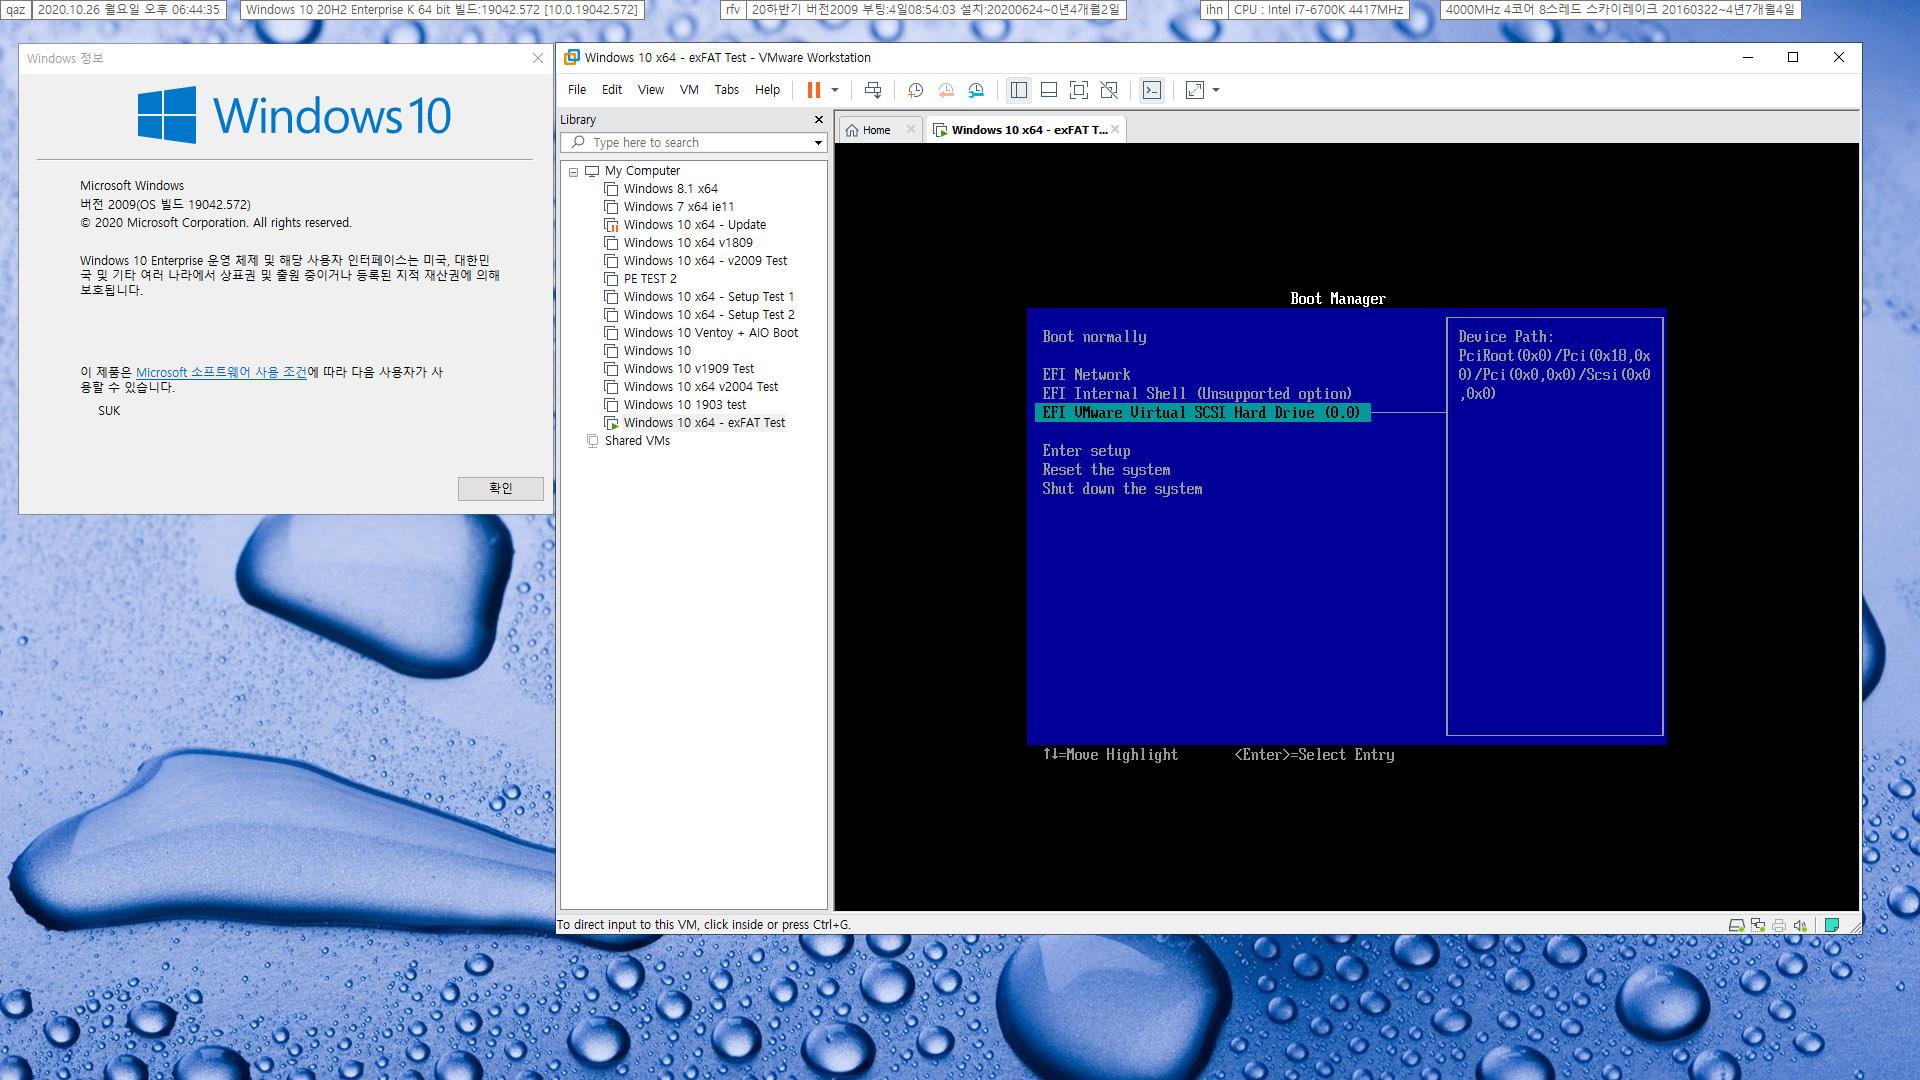 exFAT 포맷으로도 VHD 부팅이 Windows 10 버전 1903부터 된다고 하여 테스트 - 완전 생고생 했습니다 2020-10-26_184435.jpg